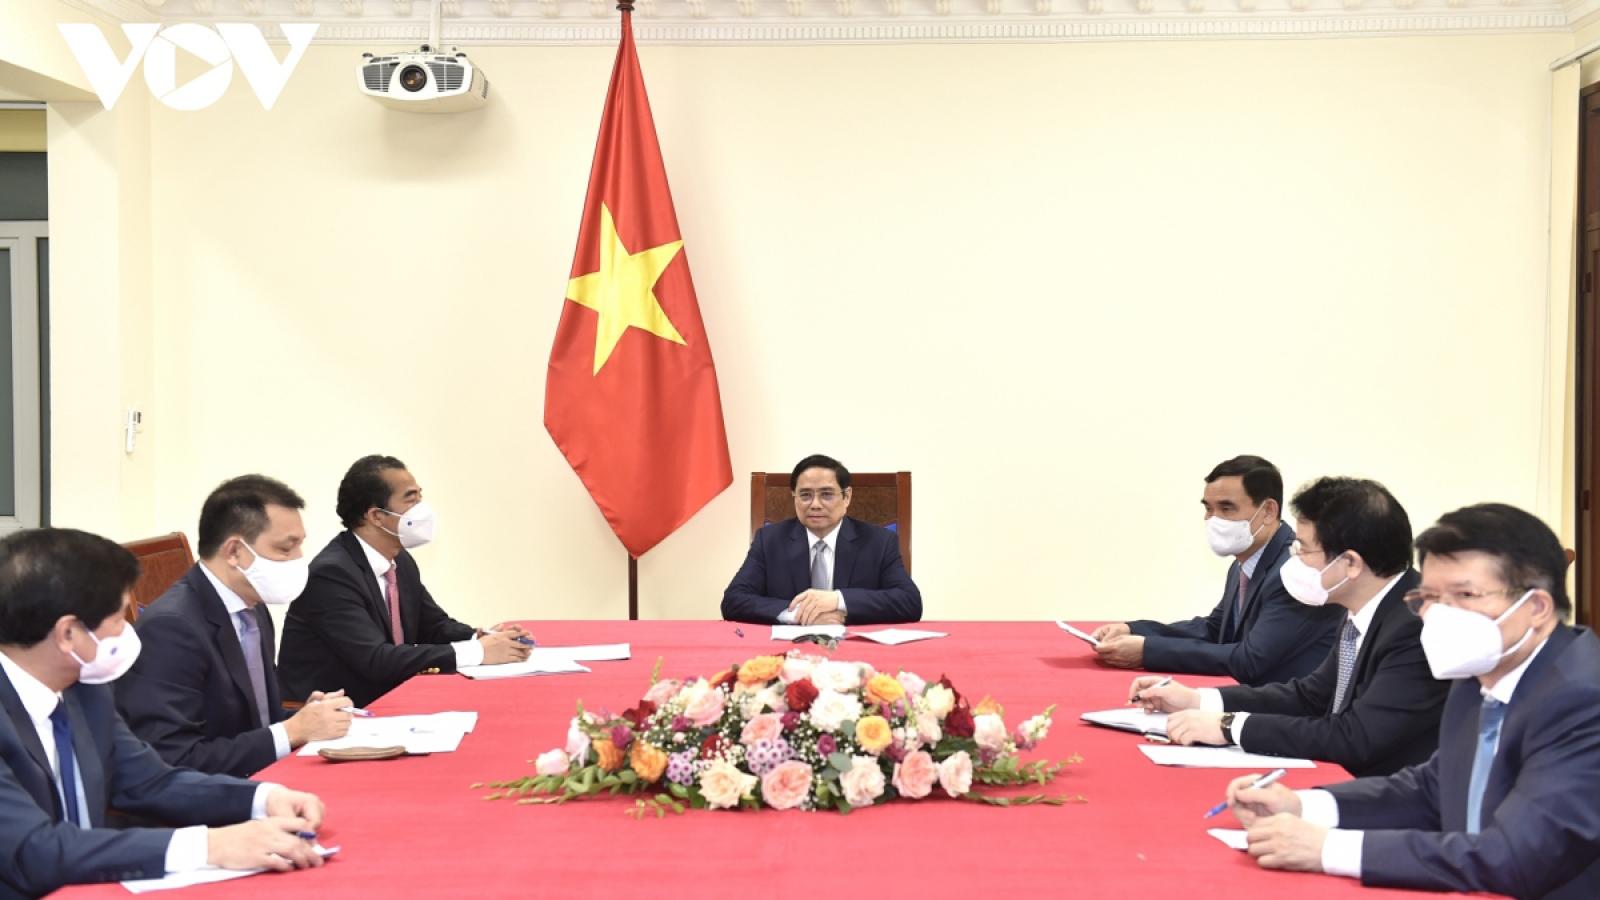 Vietnam seeks COVID-19 vaccine supply support from Belgium